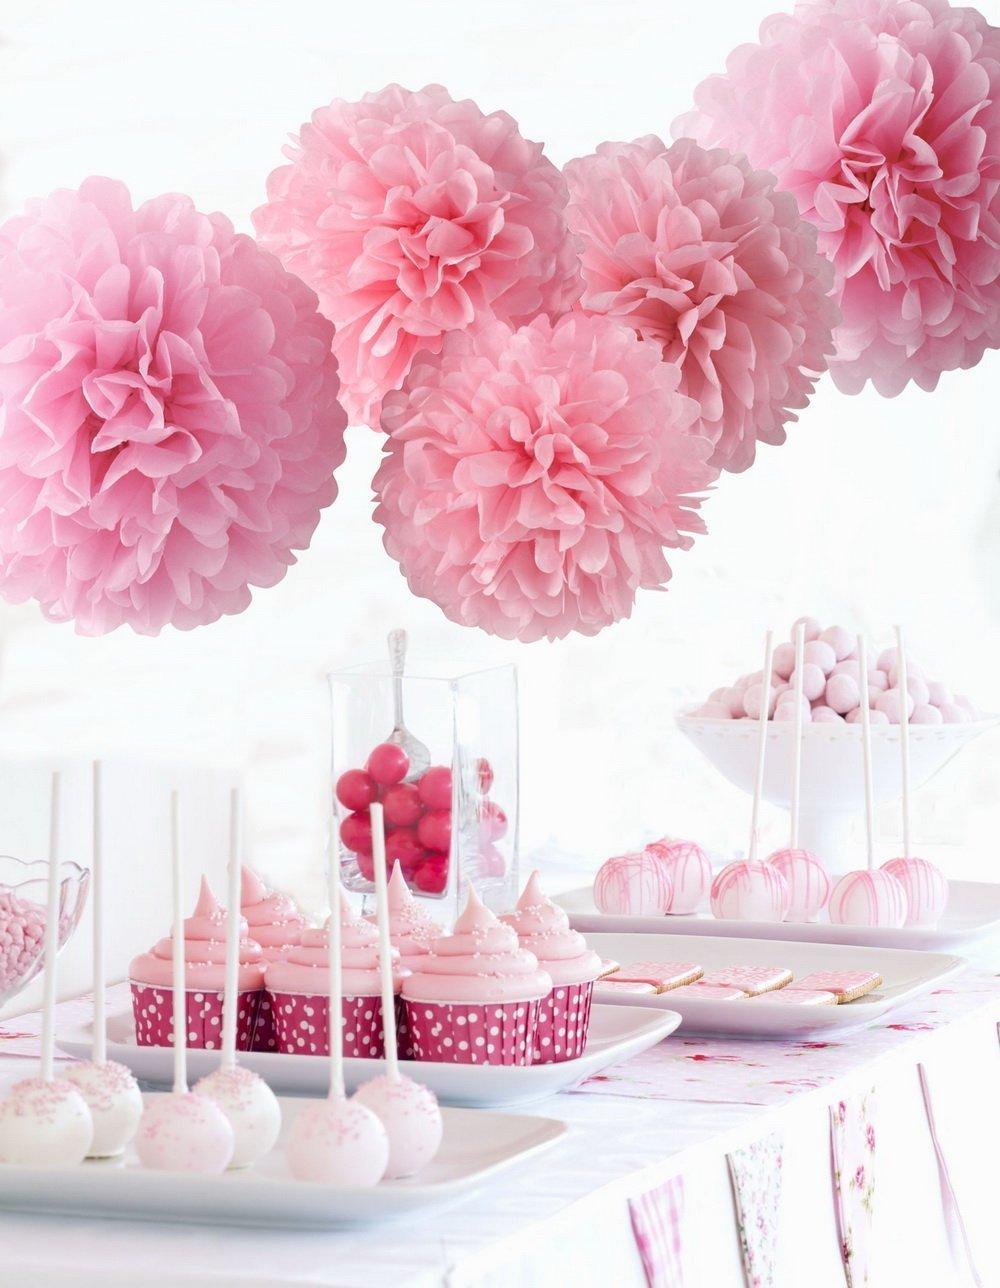 Buy Pom Poms 5pcs Tissue Paper Flowerspink2 Sizestissue Paper